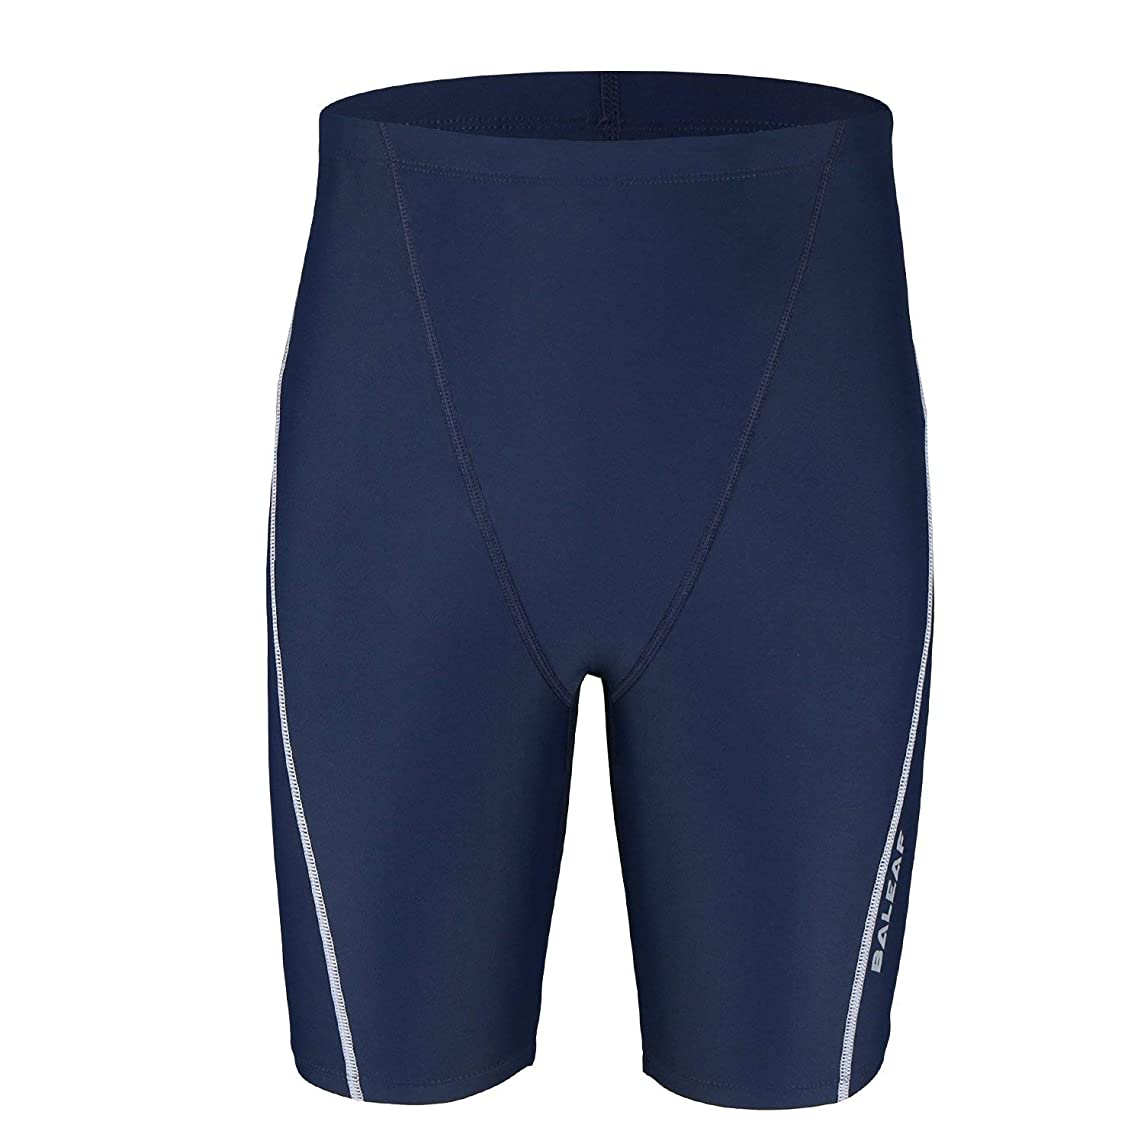 Baleaf Boys' Athletic Swim Jammer UPF 50+ Quick Dry Youth Training Swimming Short